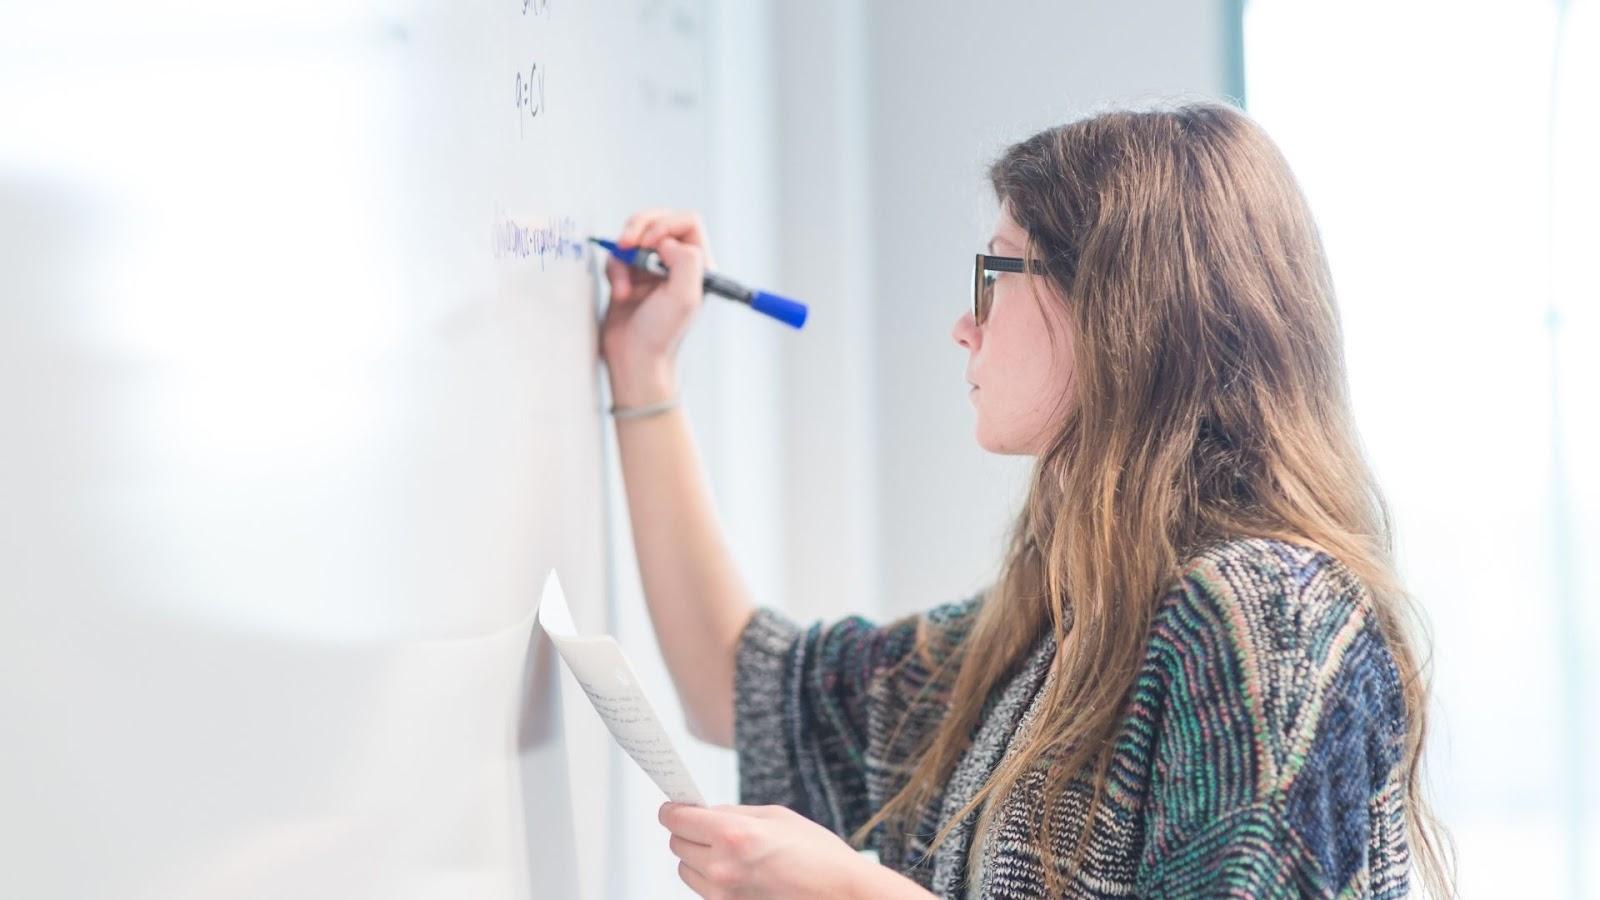 female student solving a math problem